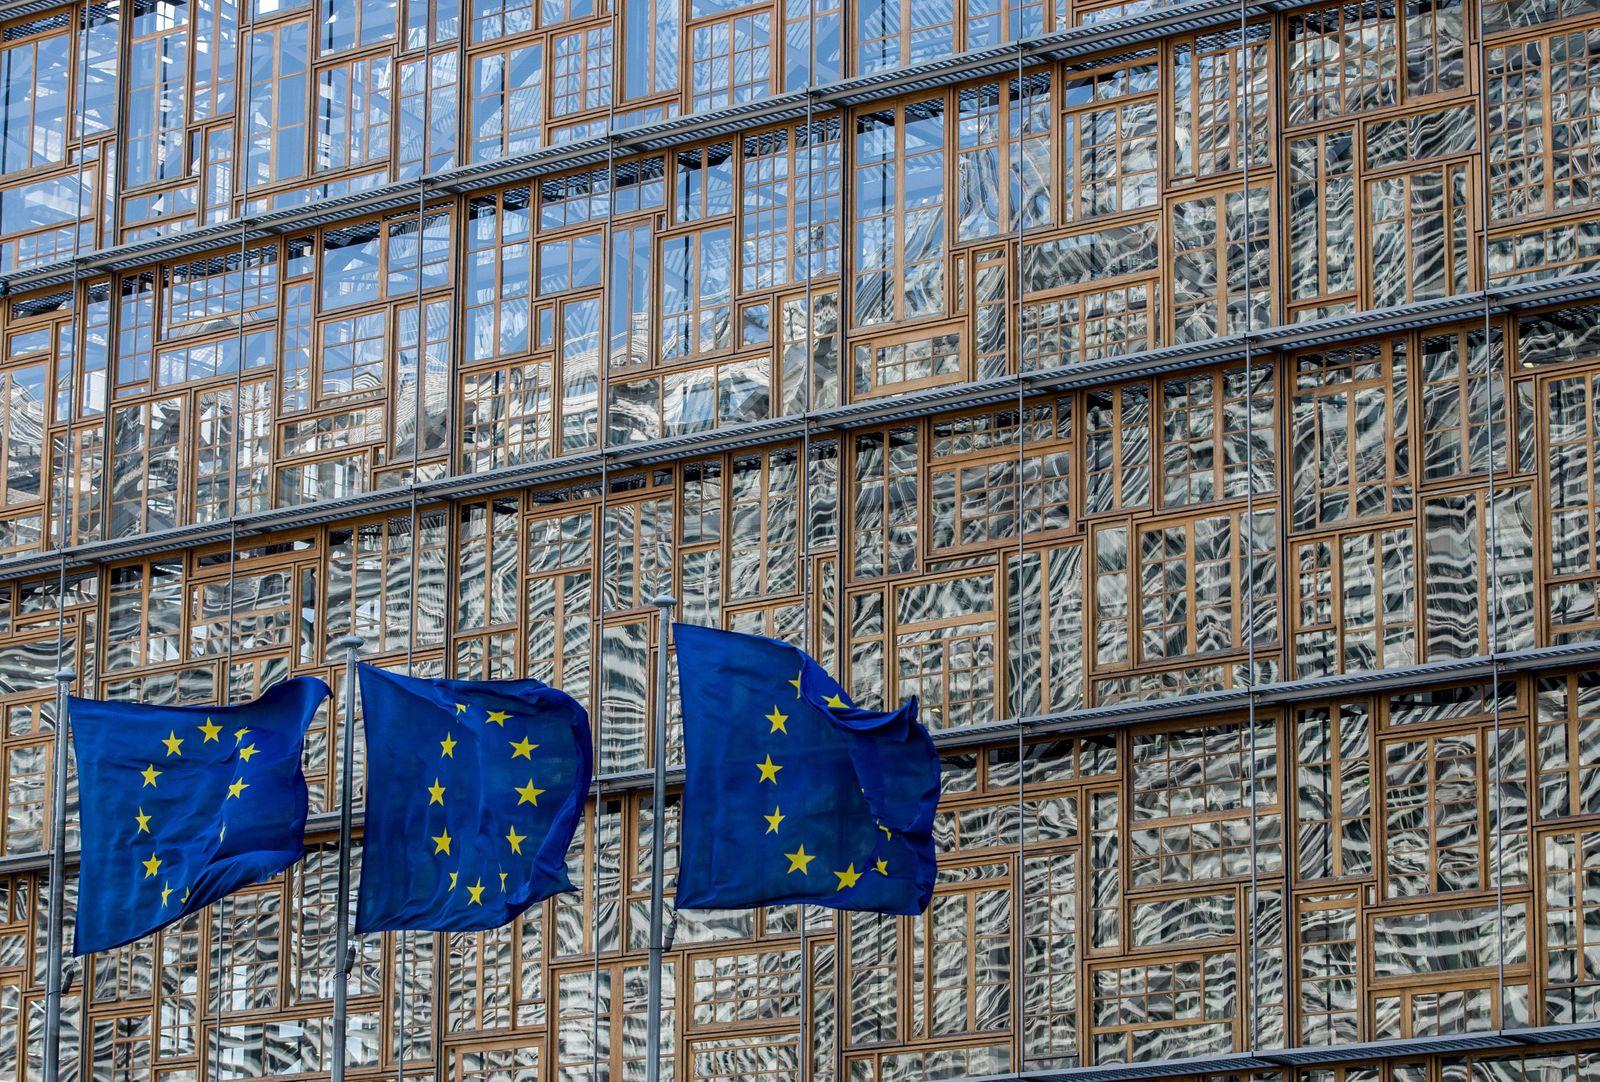 Illustration European Council, Brussels, Belgium - 26 Mar 2020